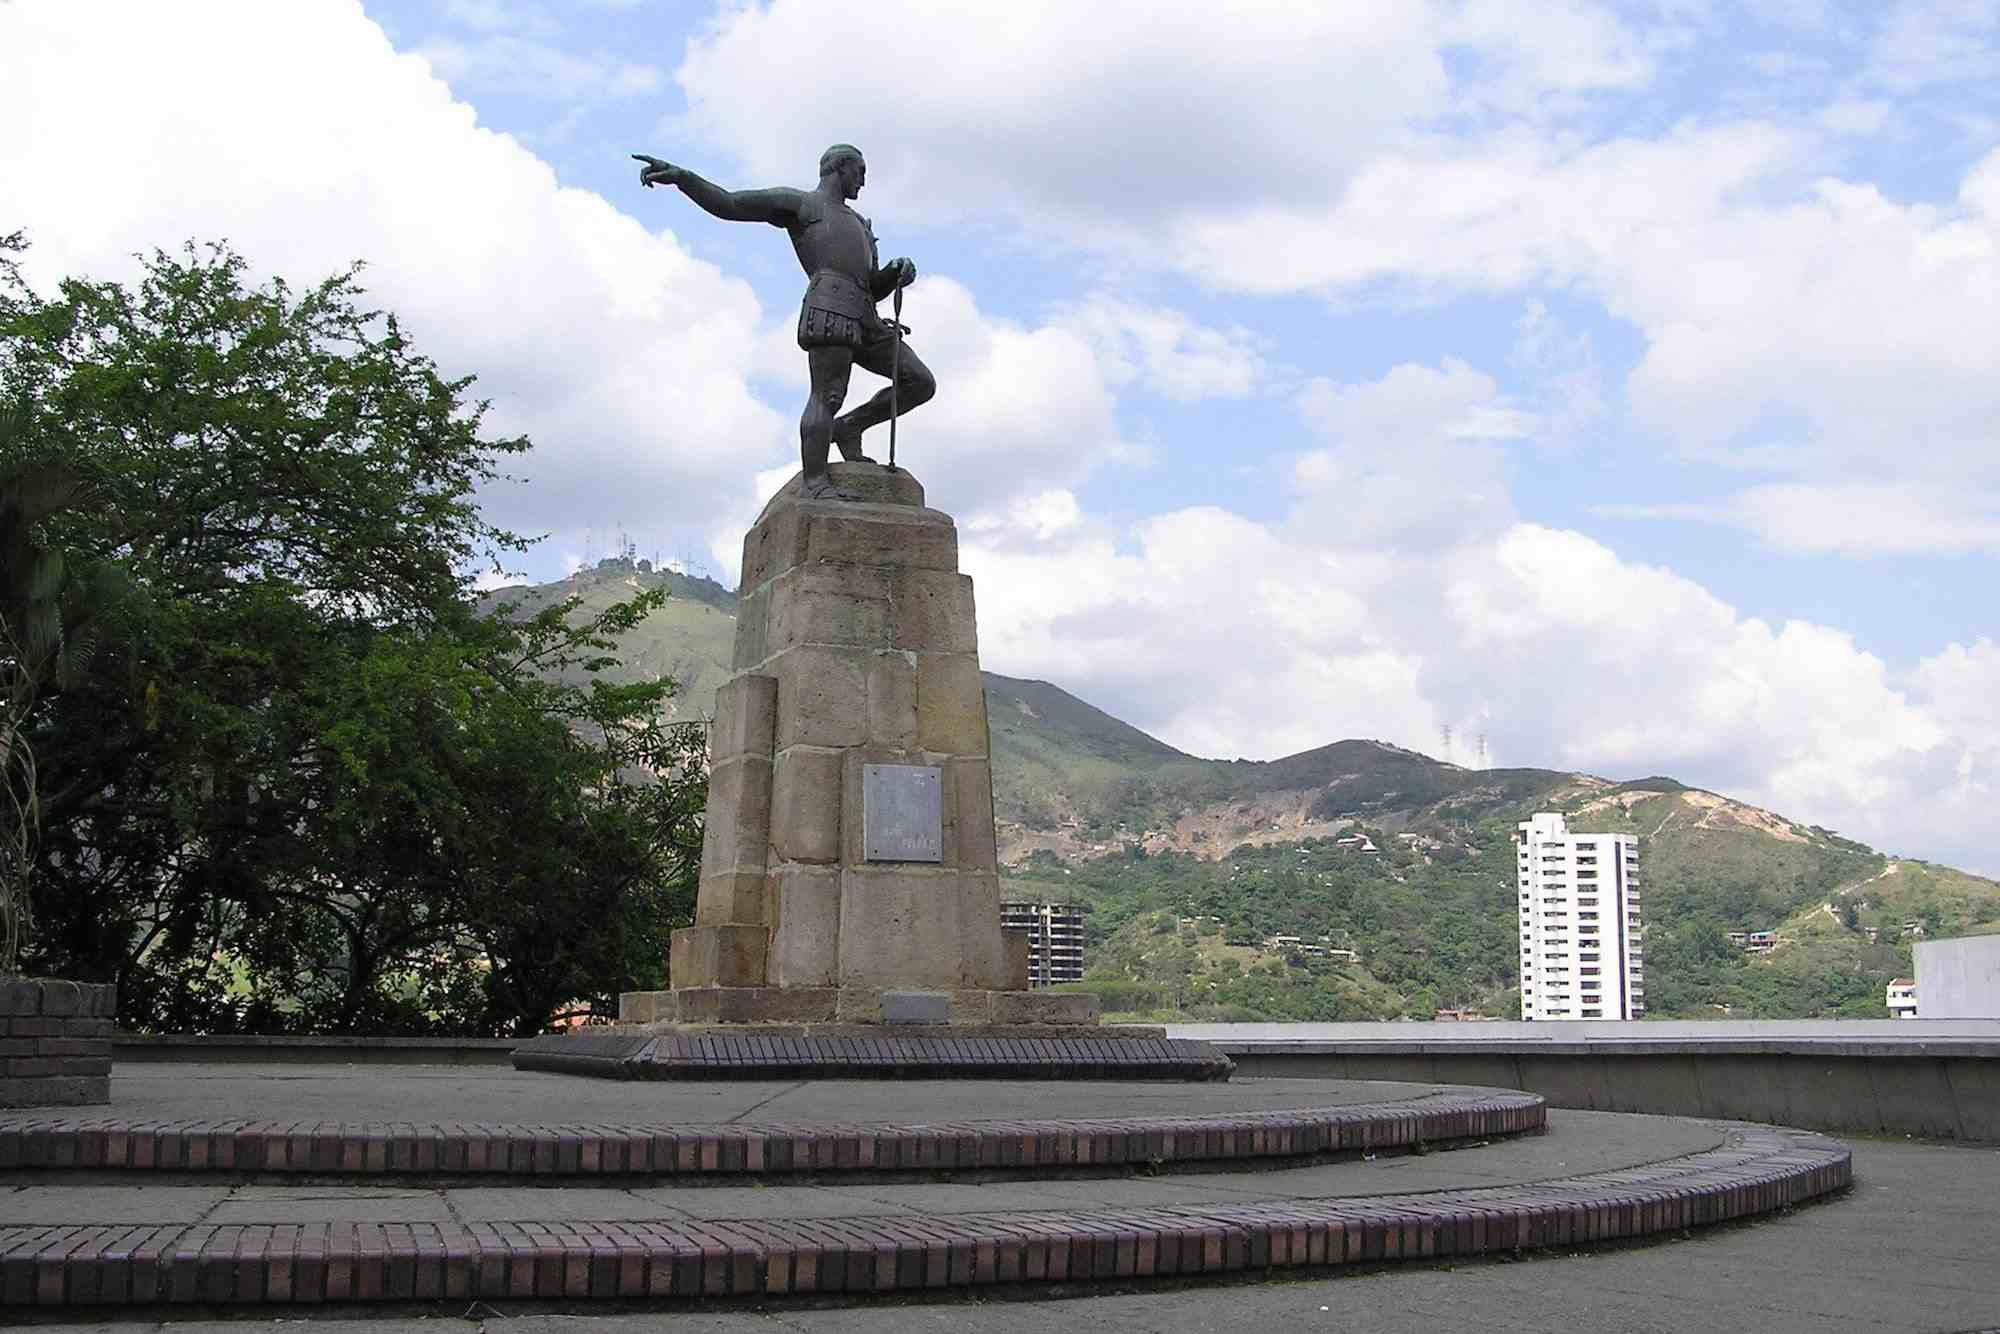 Statue of Sebastián de Belalcázar in the Colombian city of Santiago de Cali